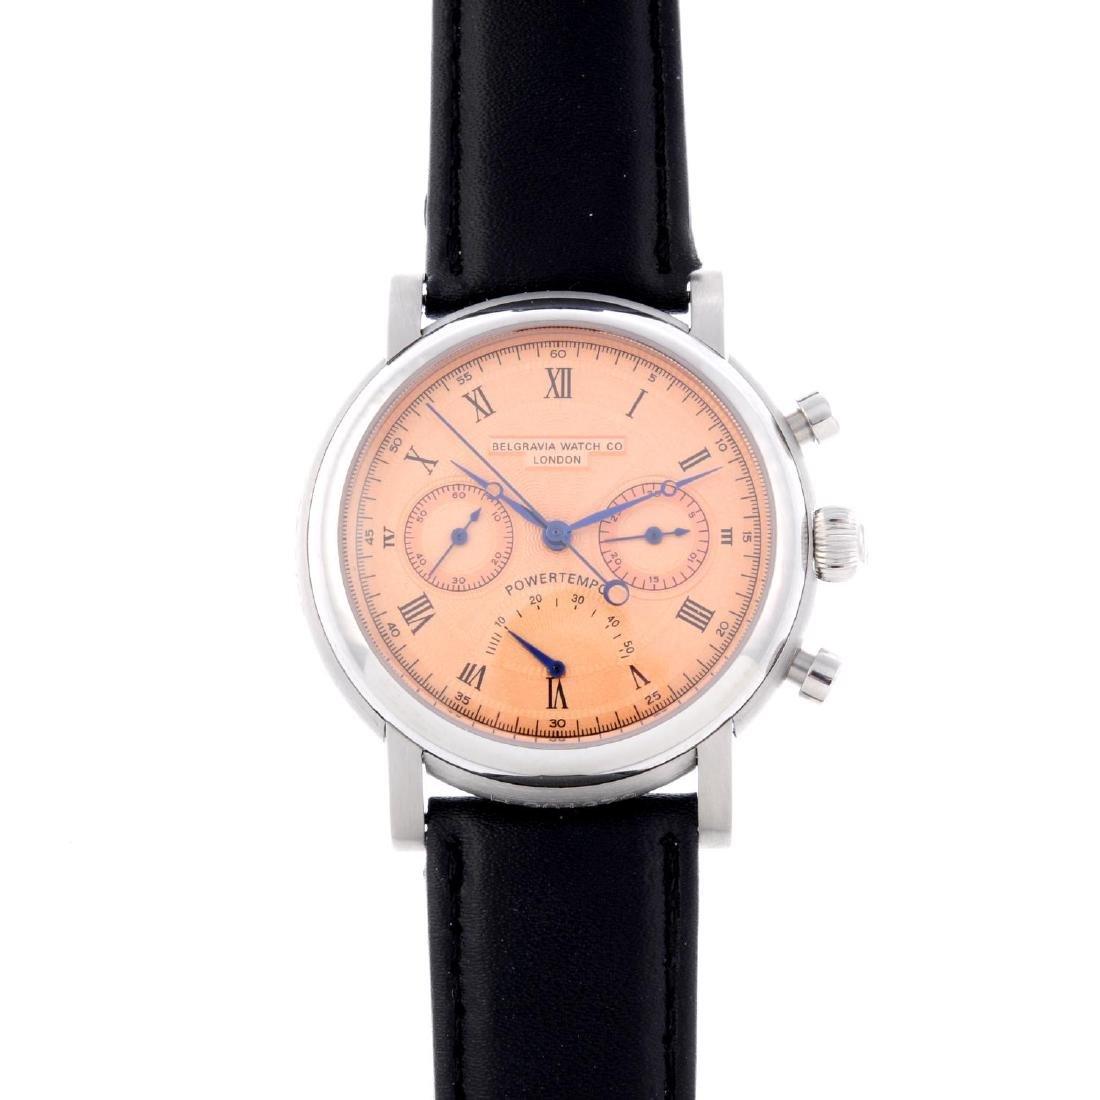 BELGRAVIA WATCH CO. - a gentleman's Power Tempo